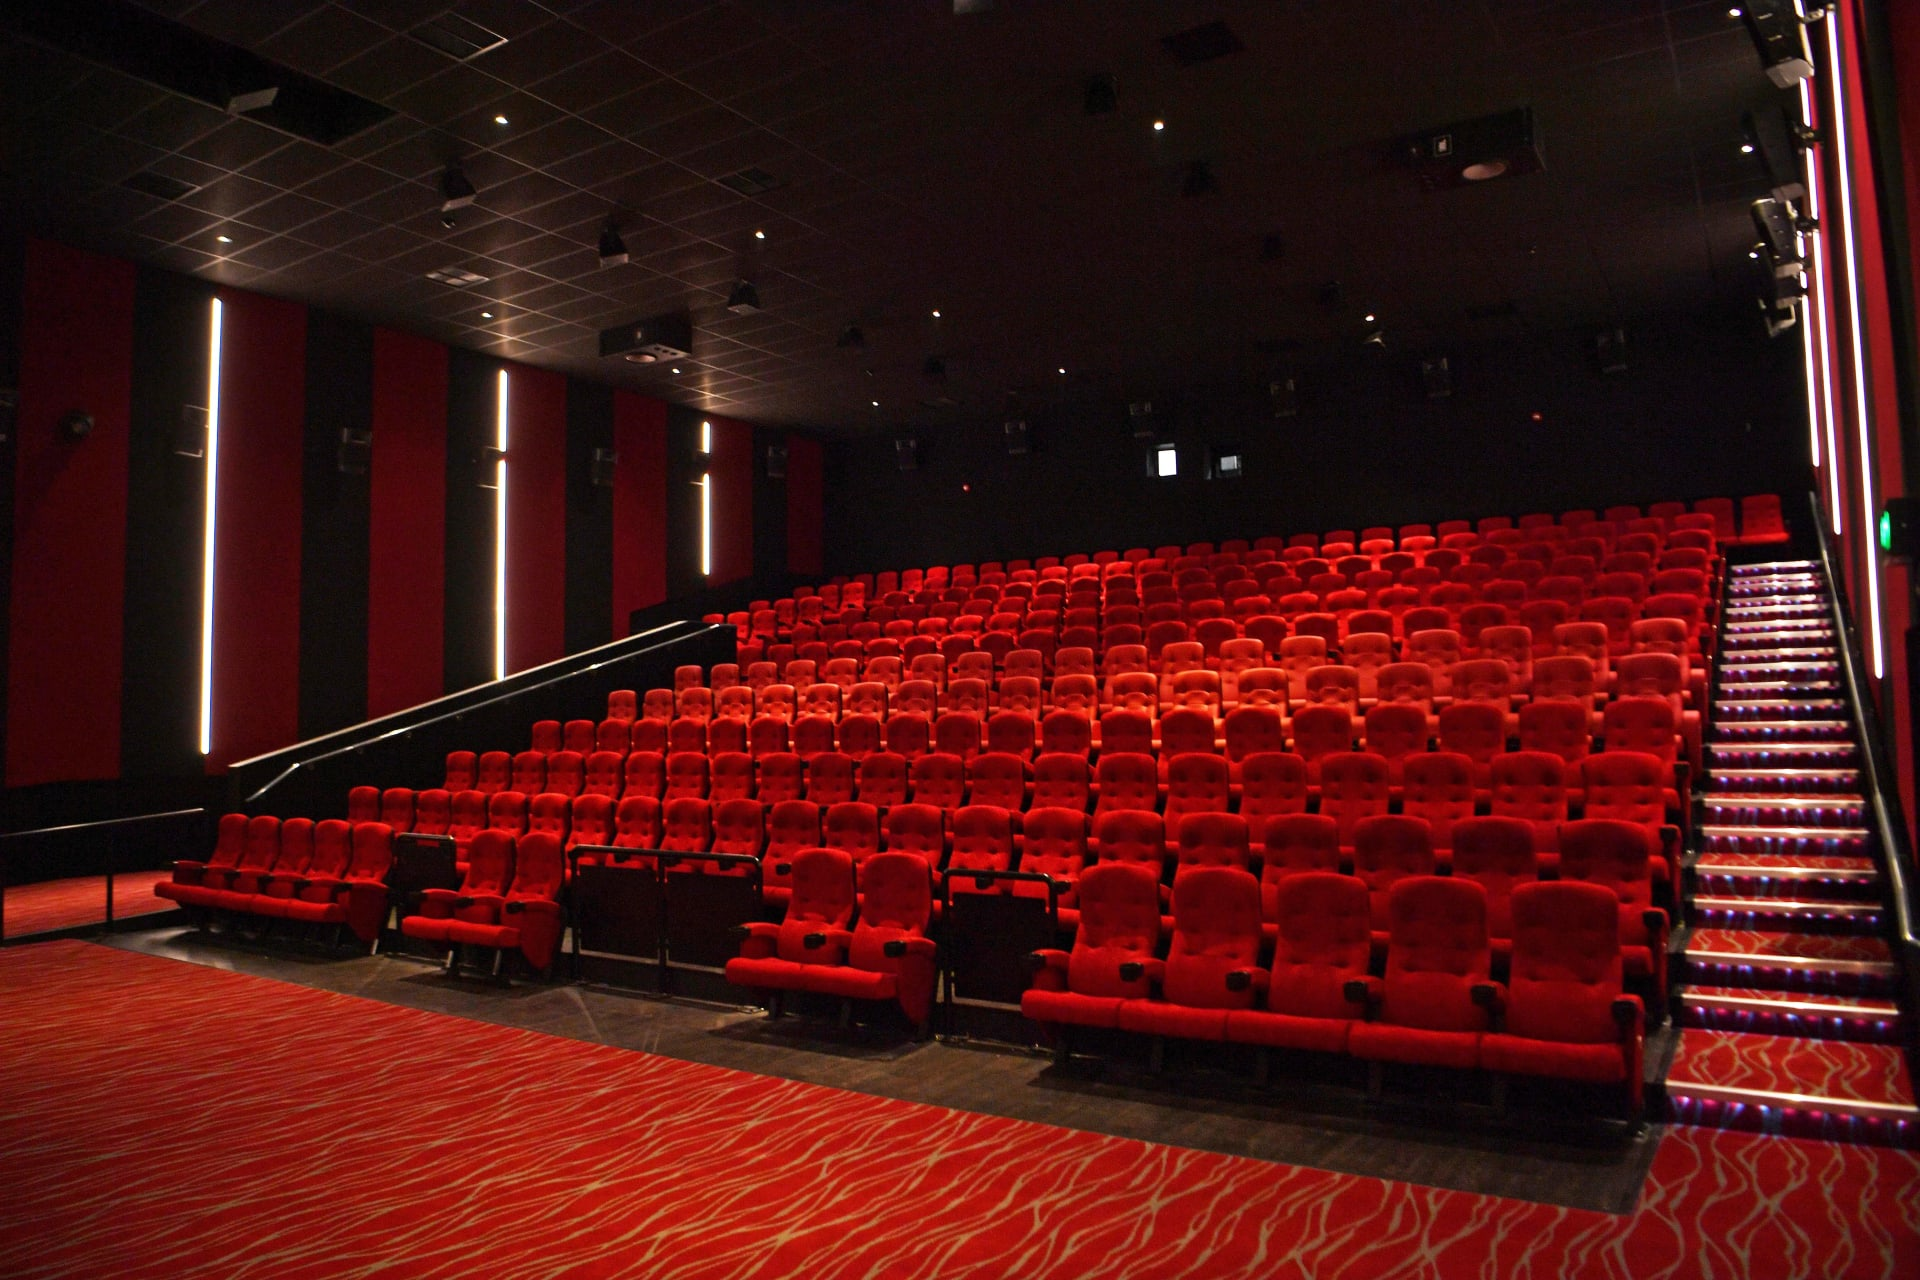 Plan Your Visit To Nova Cinema Atg Tickets